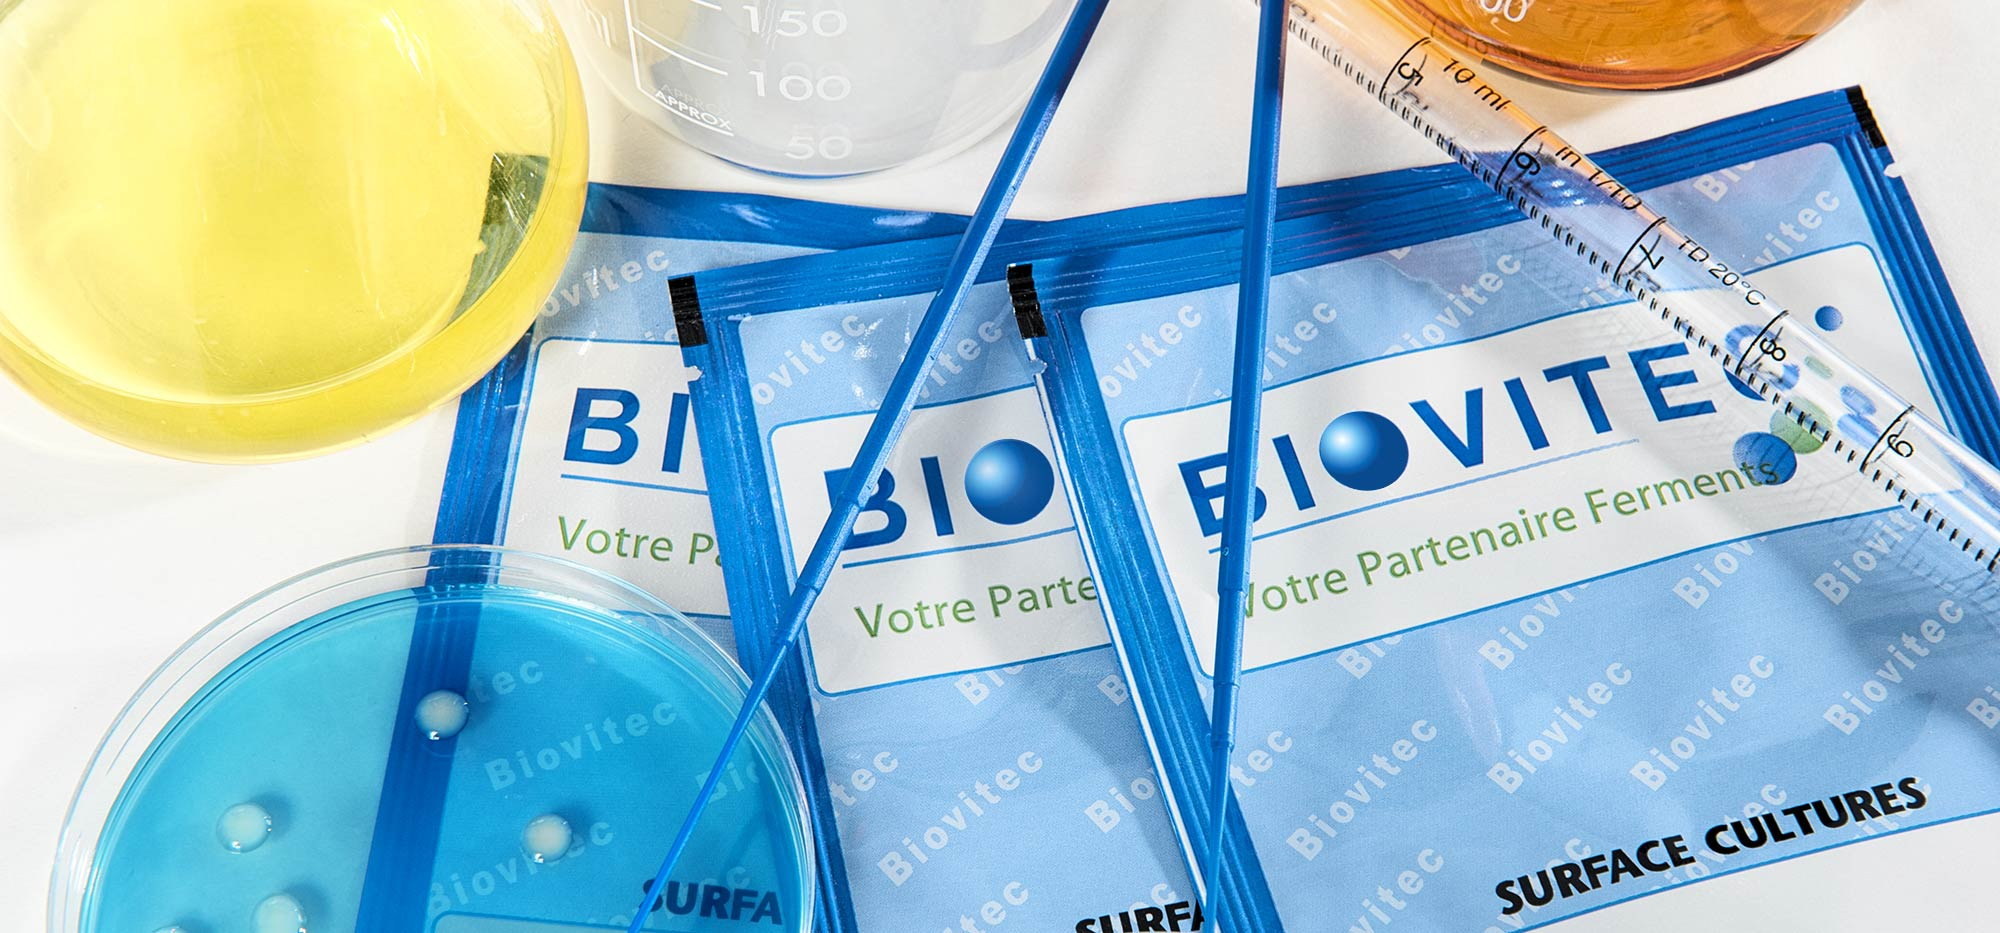 product-commitments_biovitec2